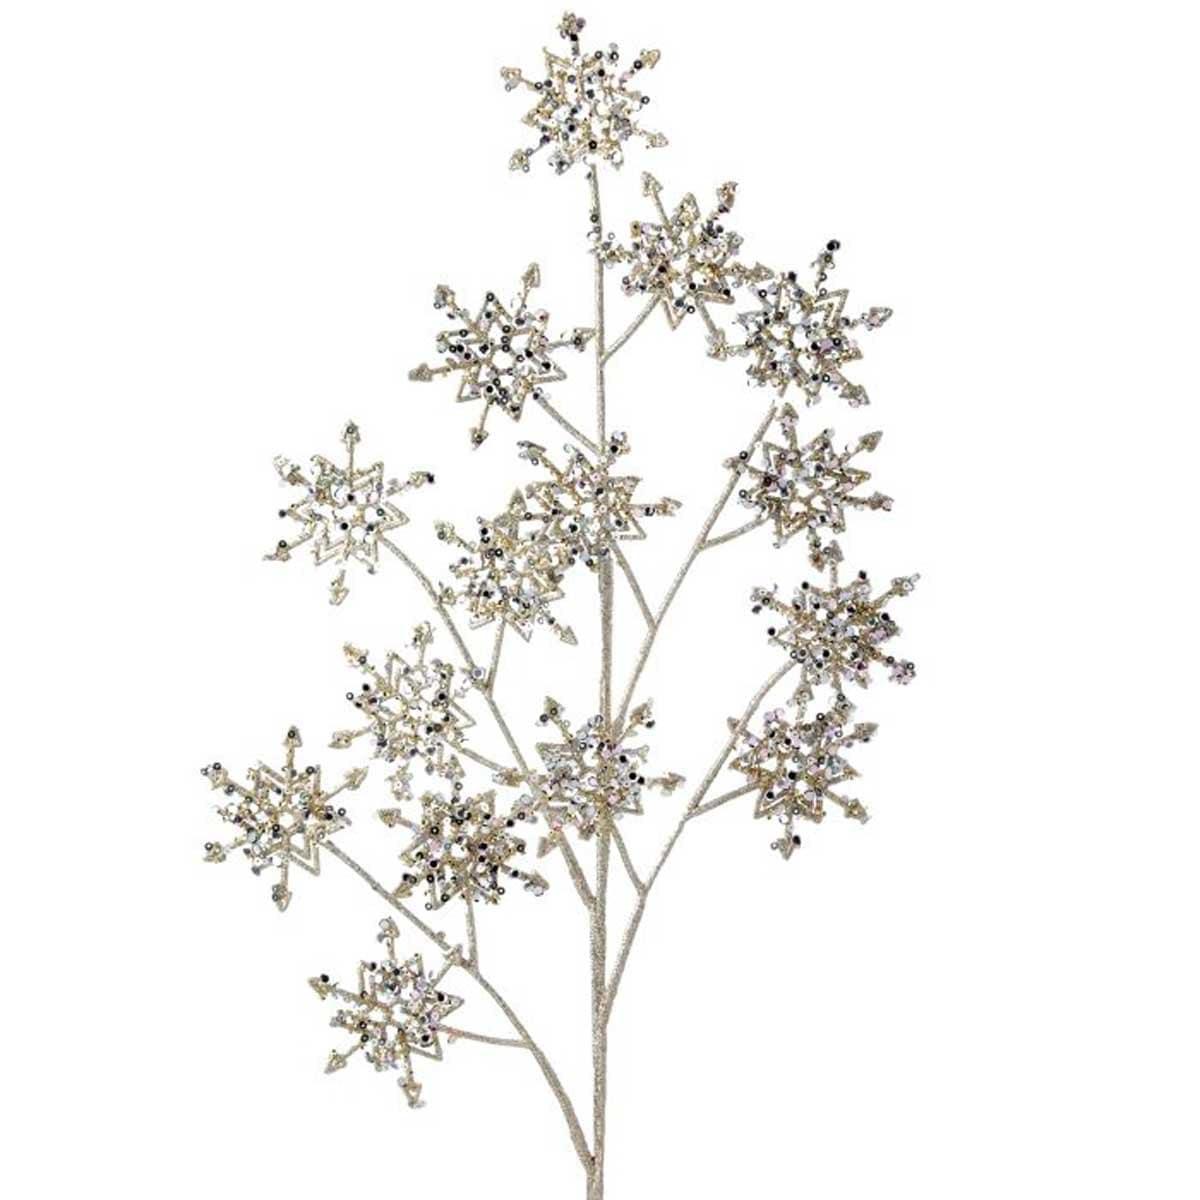 Rama de Copos de Nieve con Diamantina Color Plata 55 Cm.